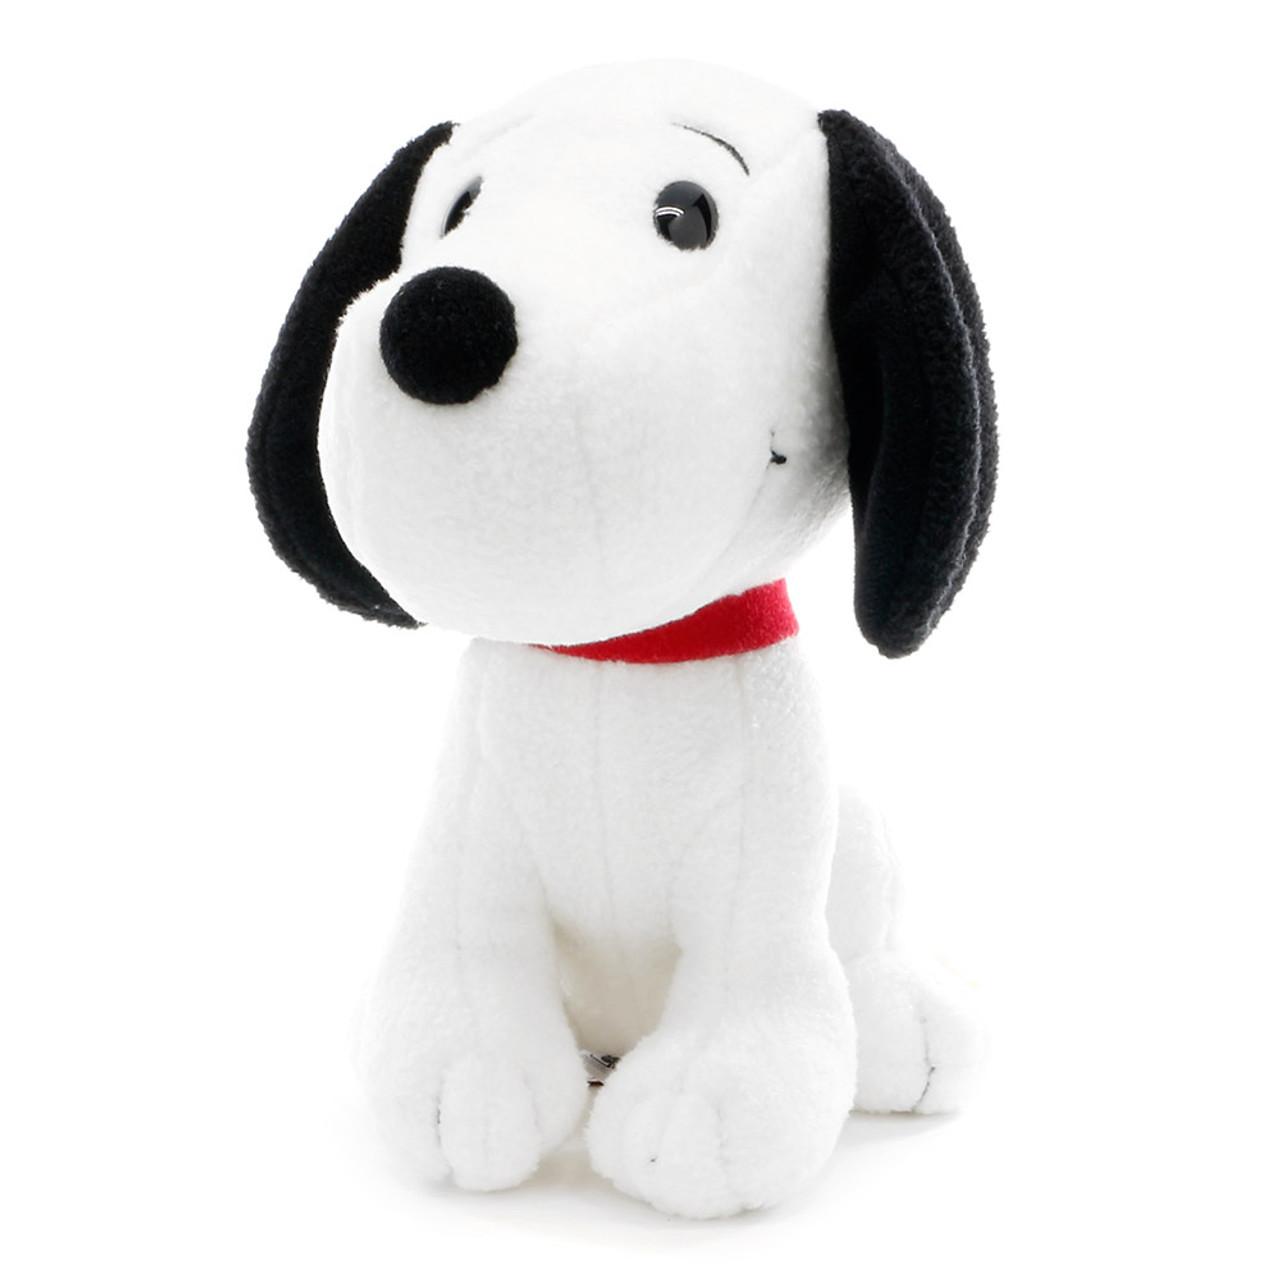 Peanuts Snoopy Vintage Version Classic Dog Super Cute Plush Doll